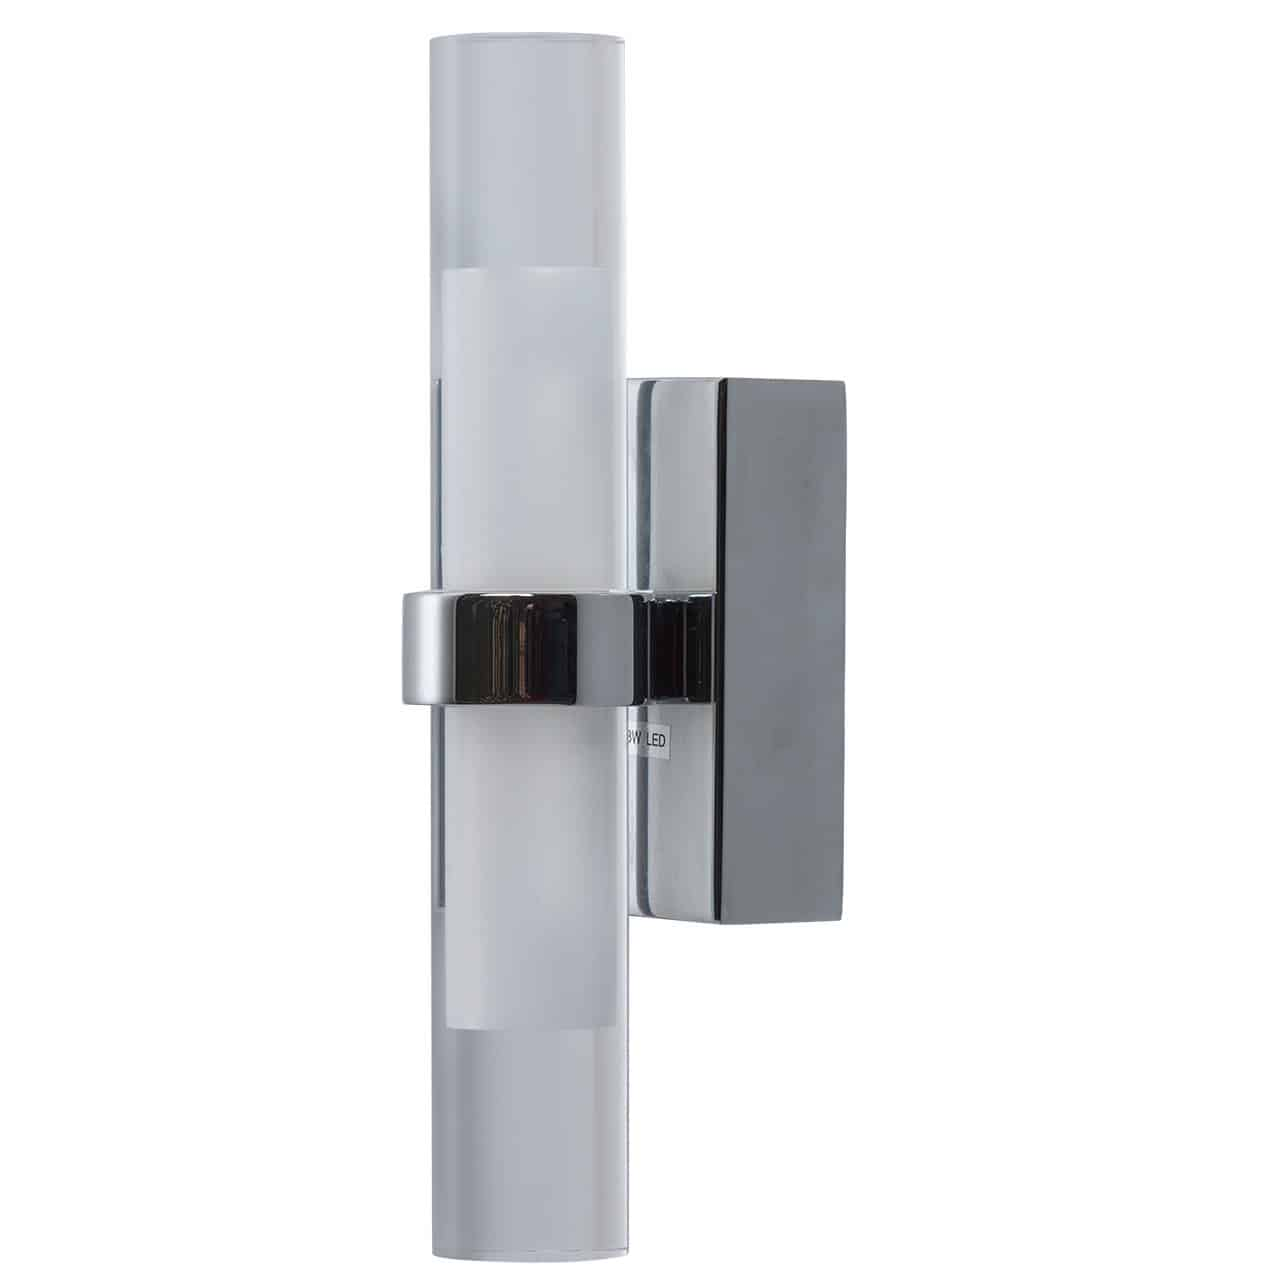 vonios viestuvas mw light techno 509023602 iburys. Black Bedroom Furniture Sets. Home Design Ideas